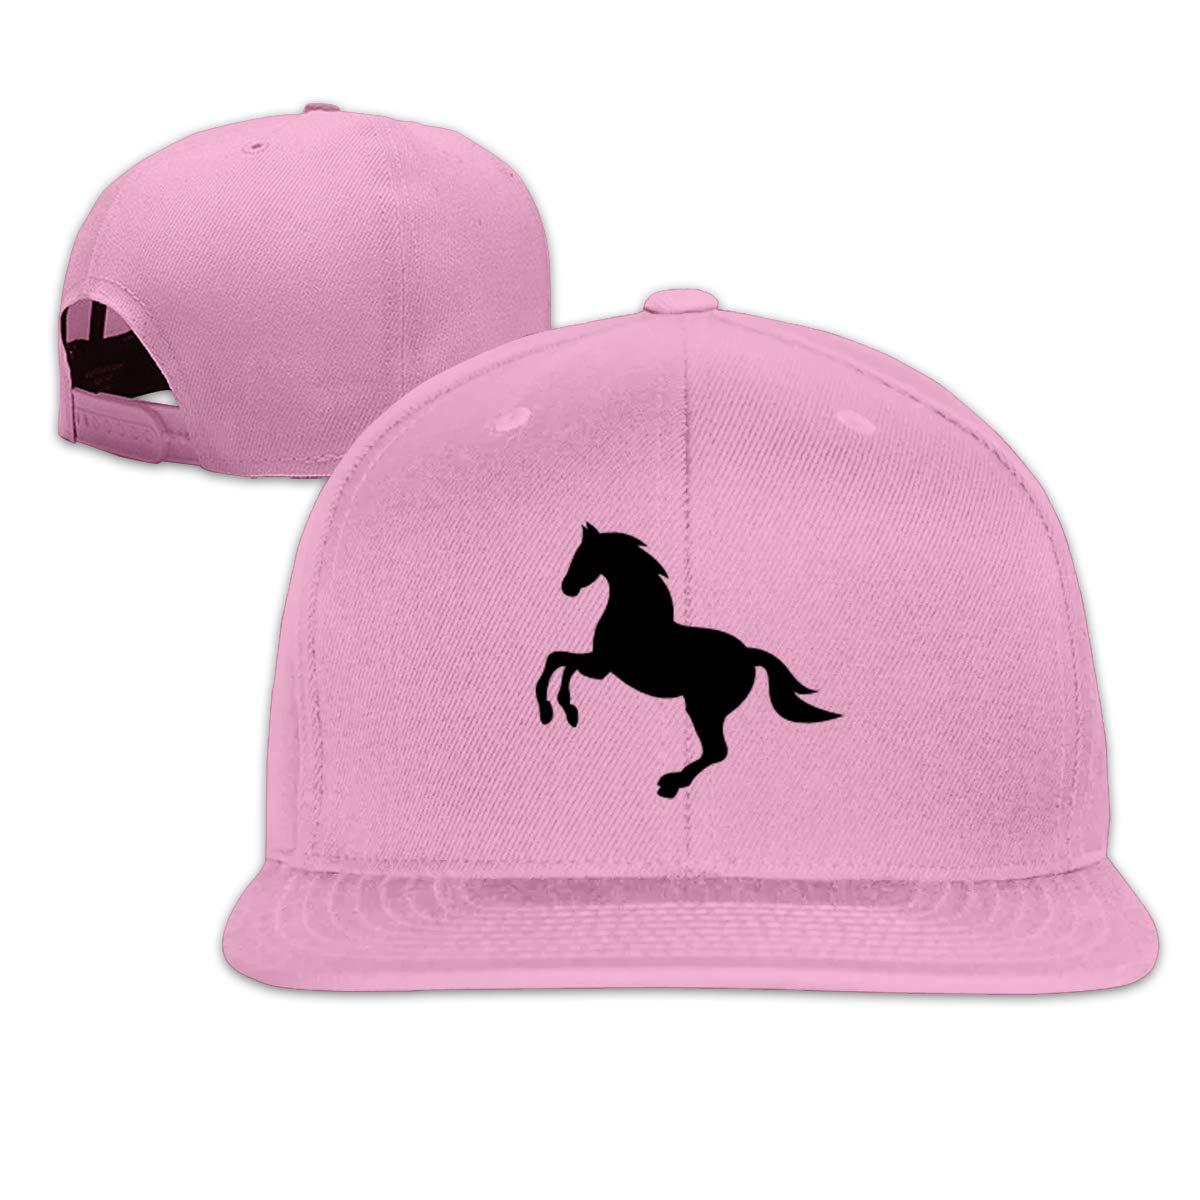 Xieadery Running Horse Flat Brim Baseball Cap Adjustable Snapback Trucker Hat Caps Hip Hop Hat